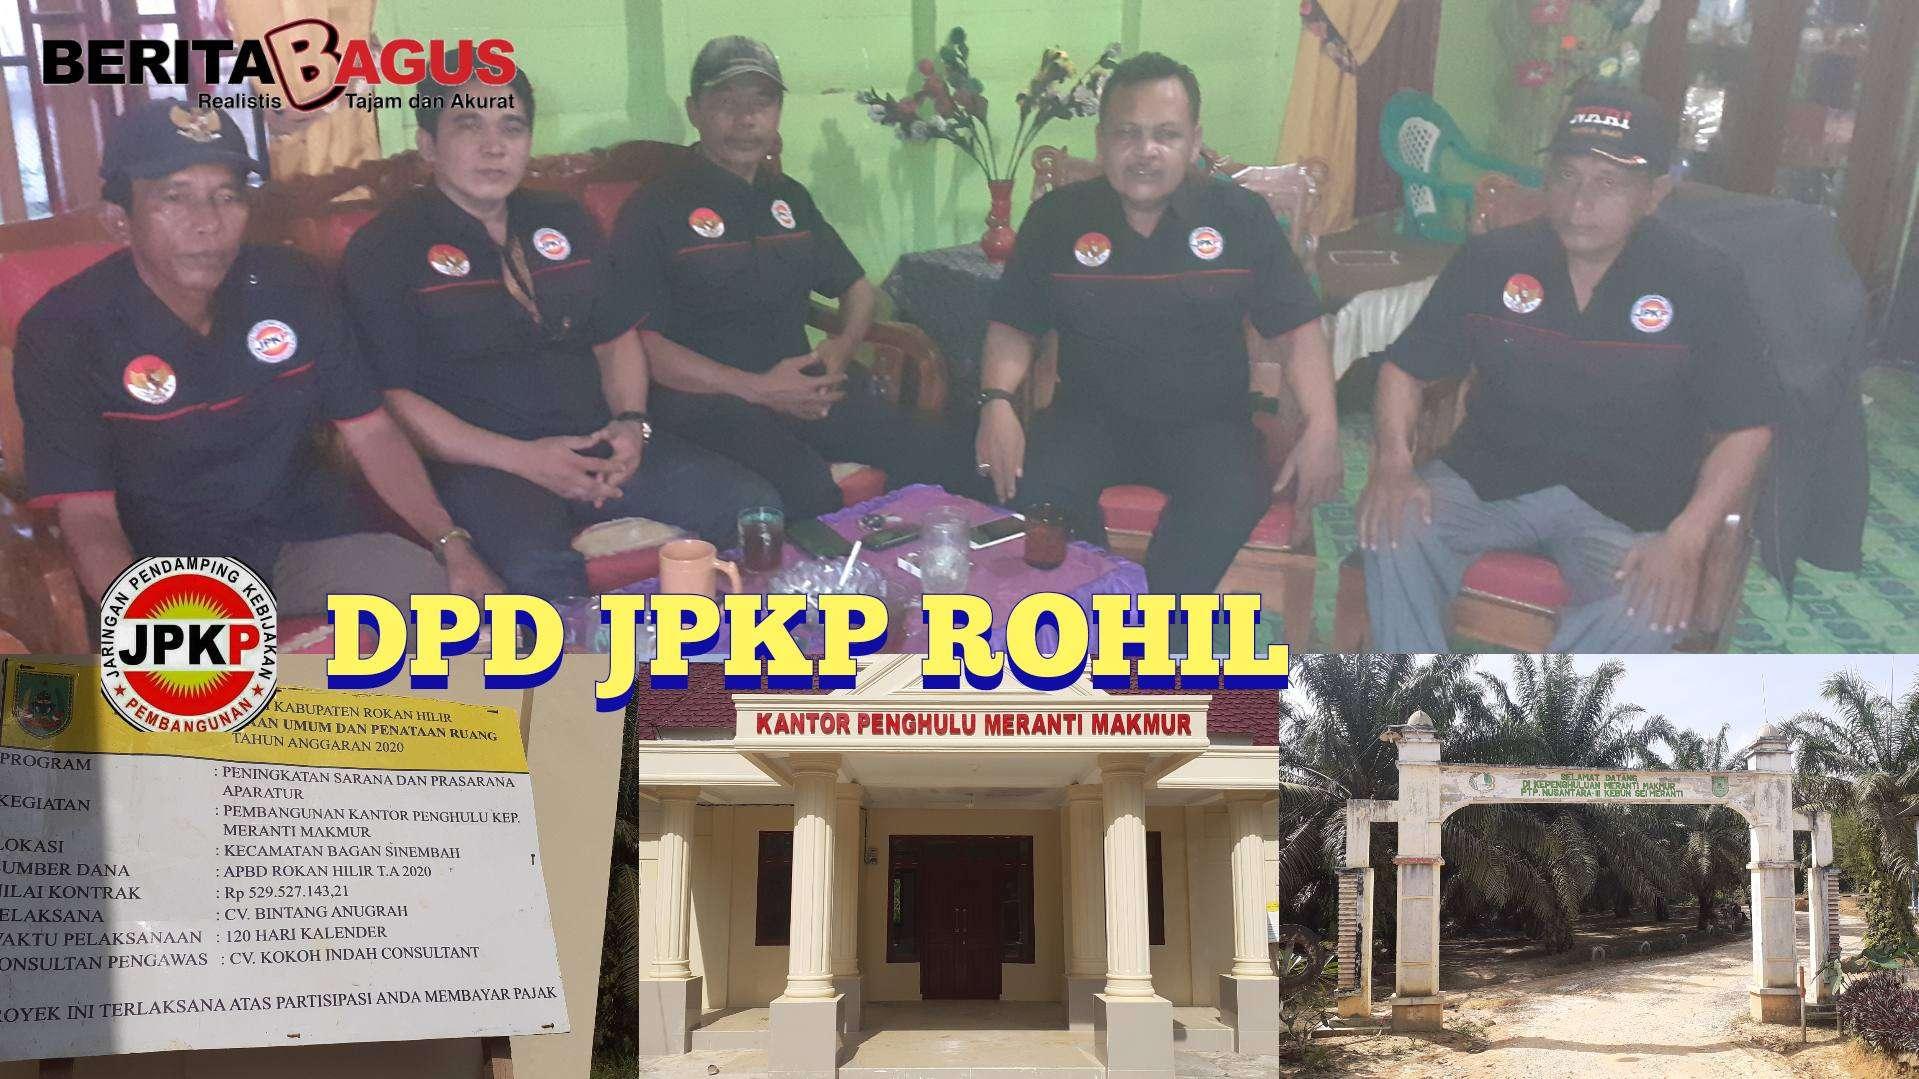 JPKP Rohil Temukan Kejanggalan Pembangunan Kantor Penghulu Meranti Makmur